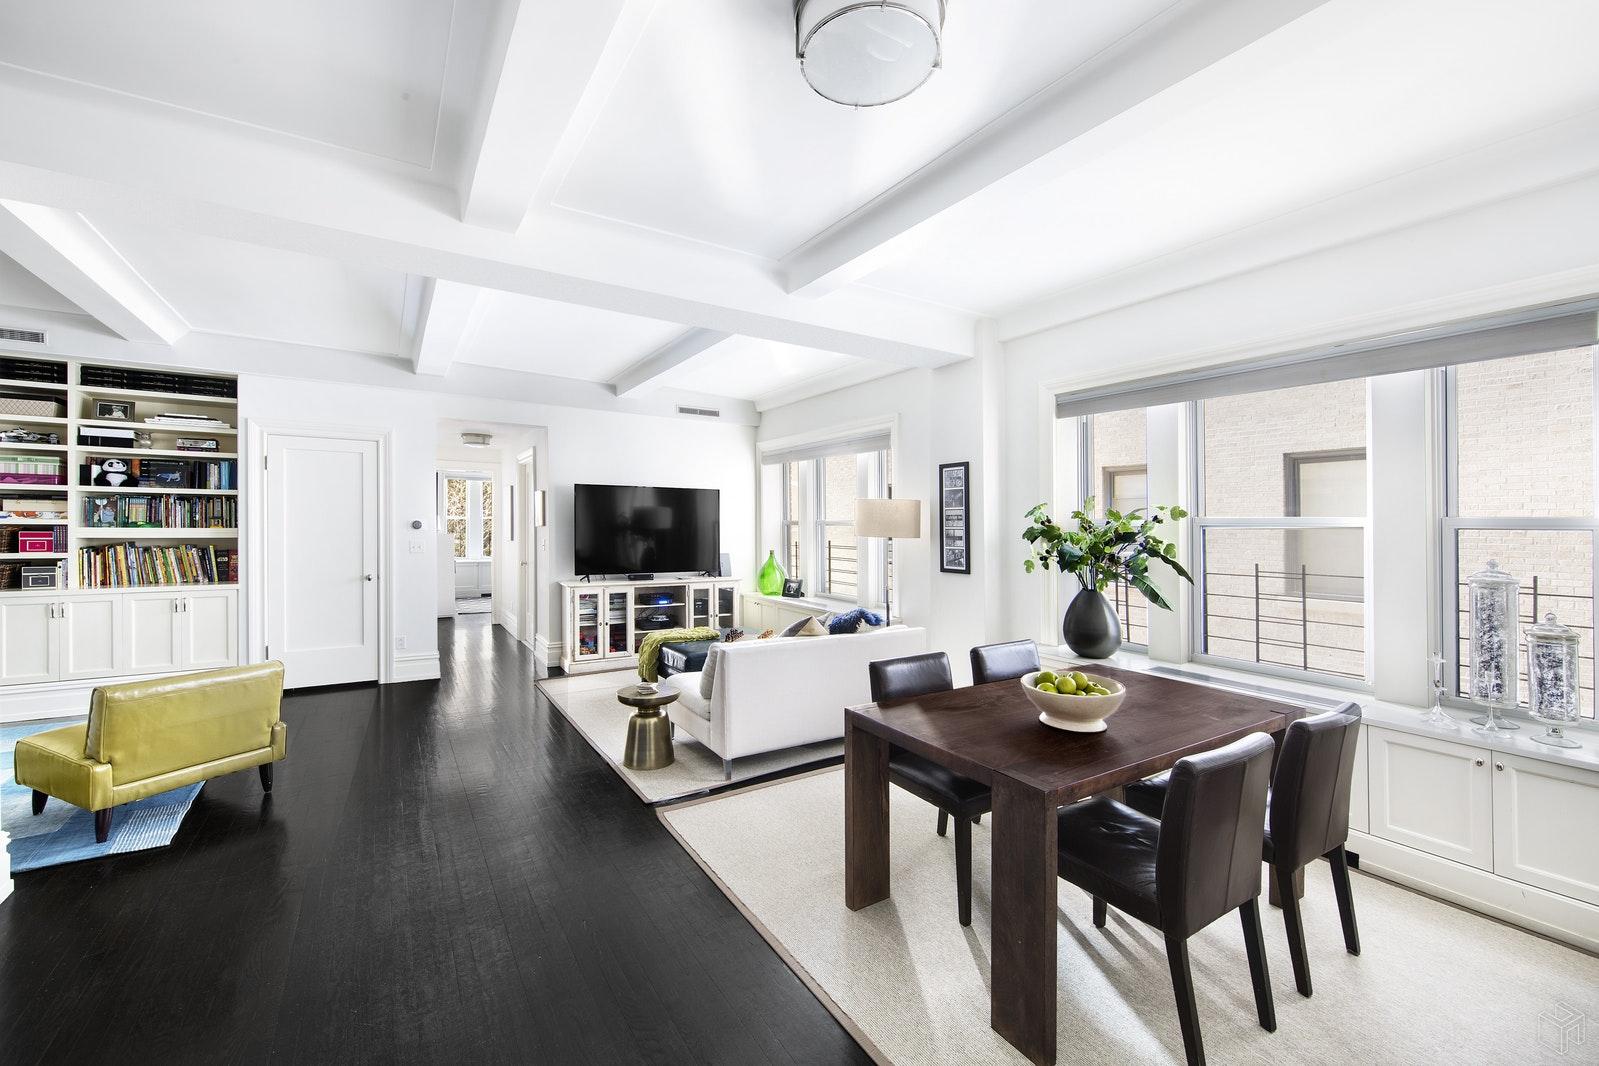 215 WEST 88TH STREET 4D, Upper West Side, $2,295,000, Web #: 18439659